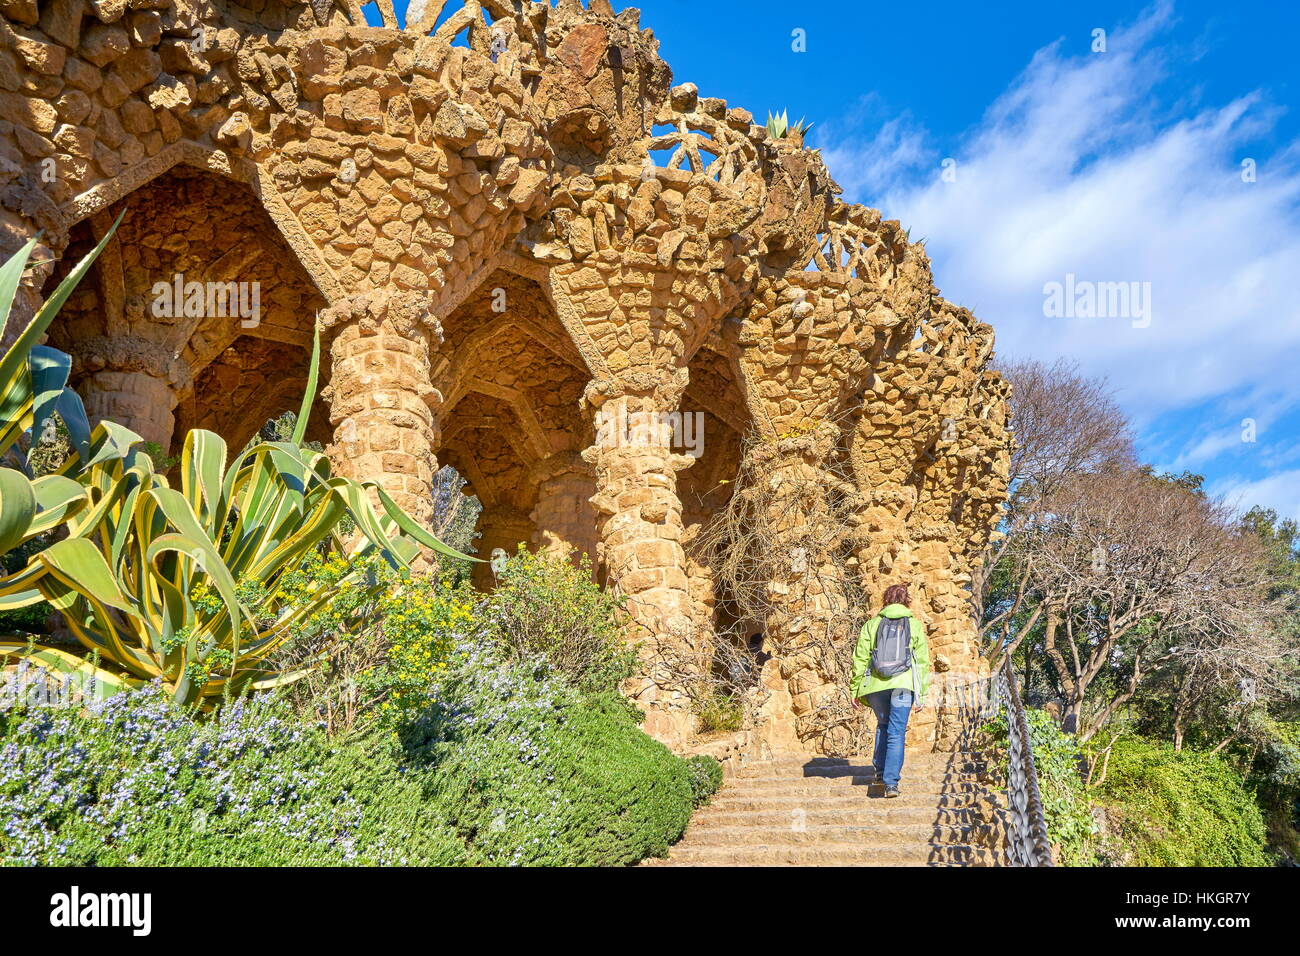 Parque Güell de Antoni Gaudí, Barcelona, Cataluña, España Imagen De Stock